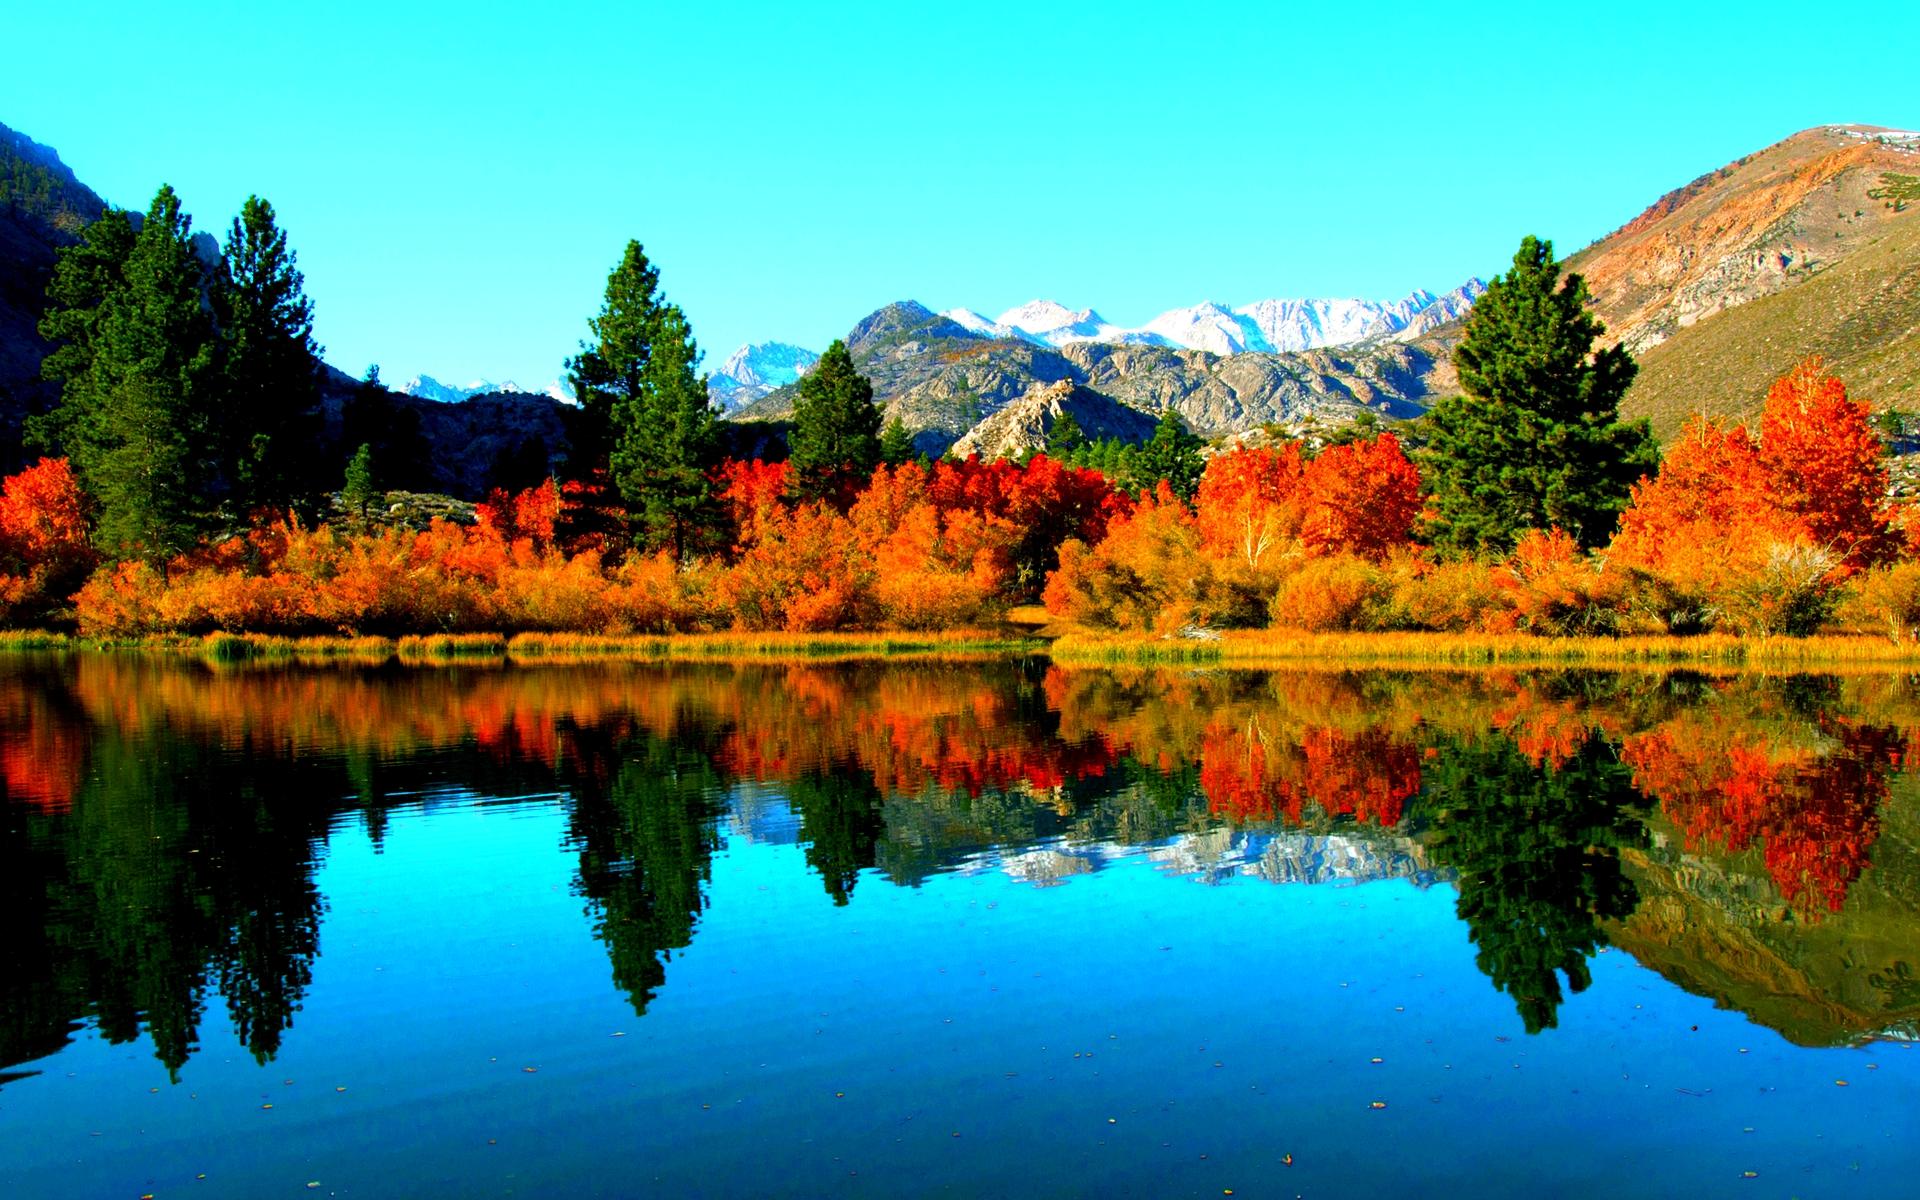 Colorado Fall Desktop Wallpaper Autumn Lake Wallpaper 1920x1200 29049